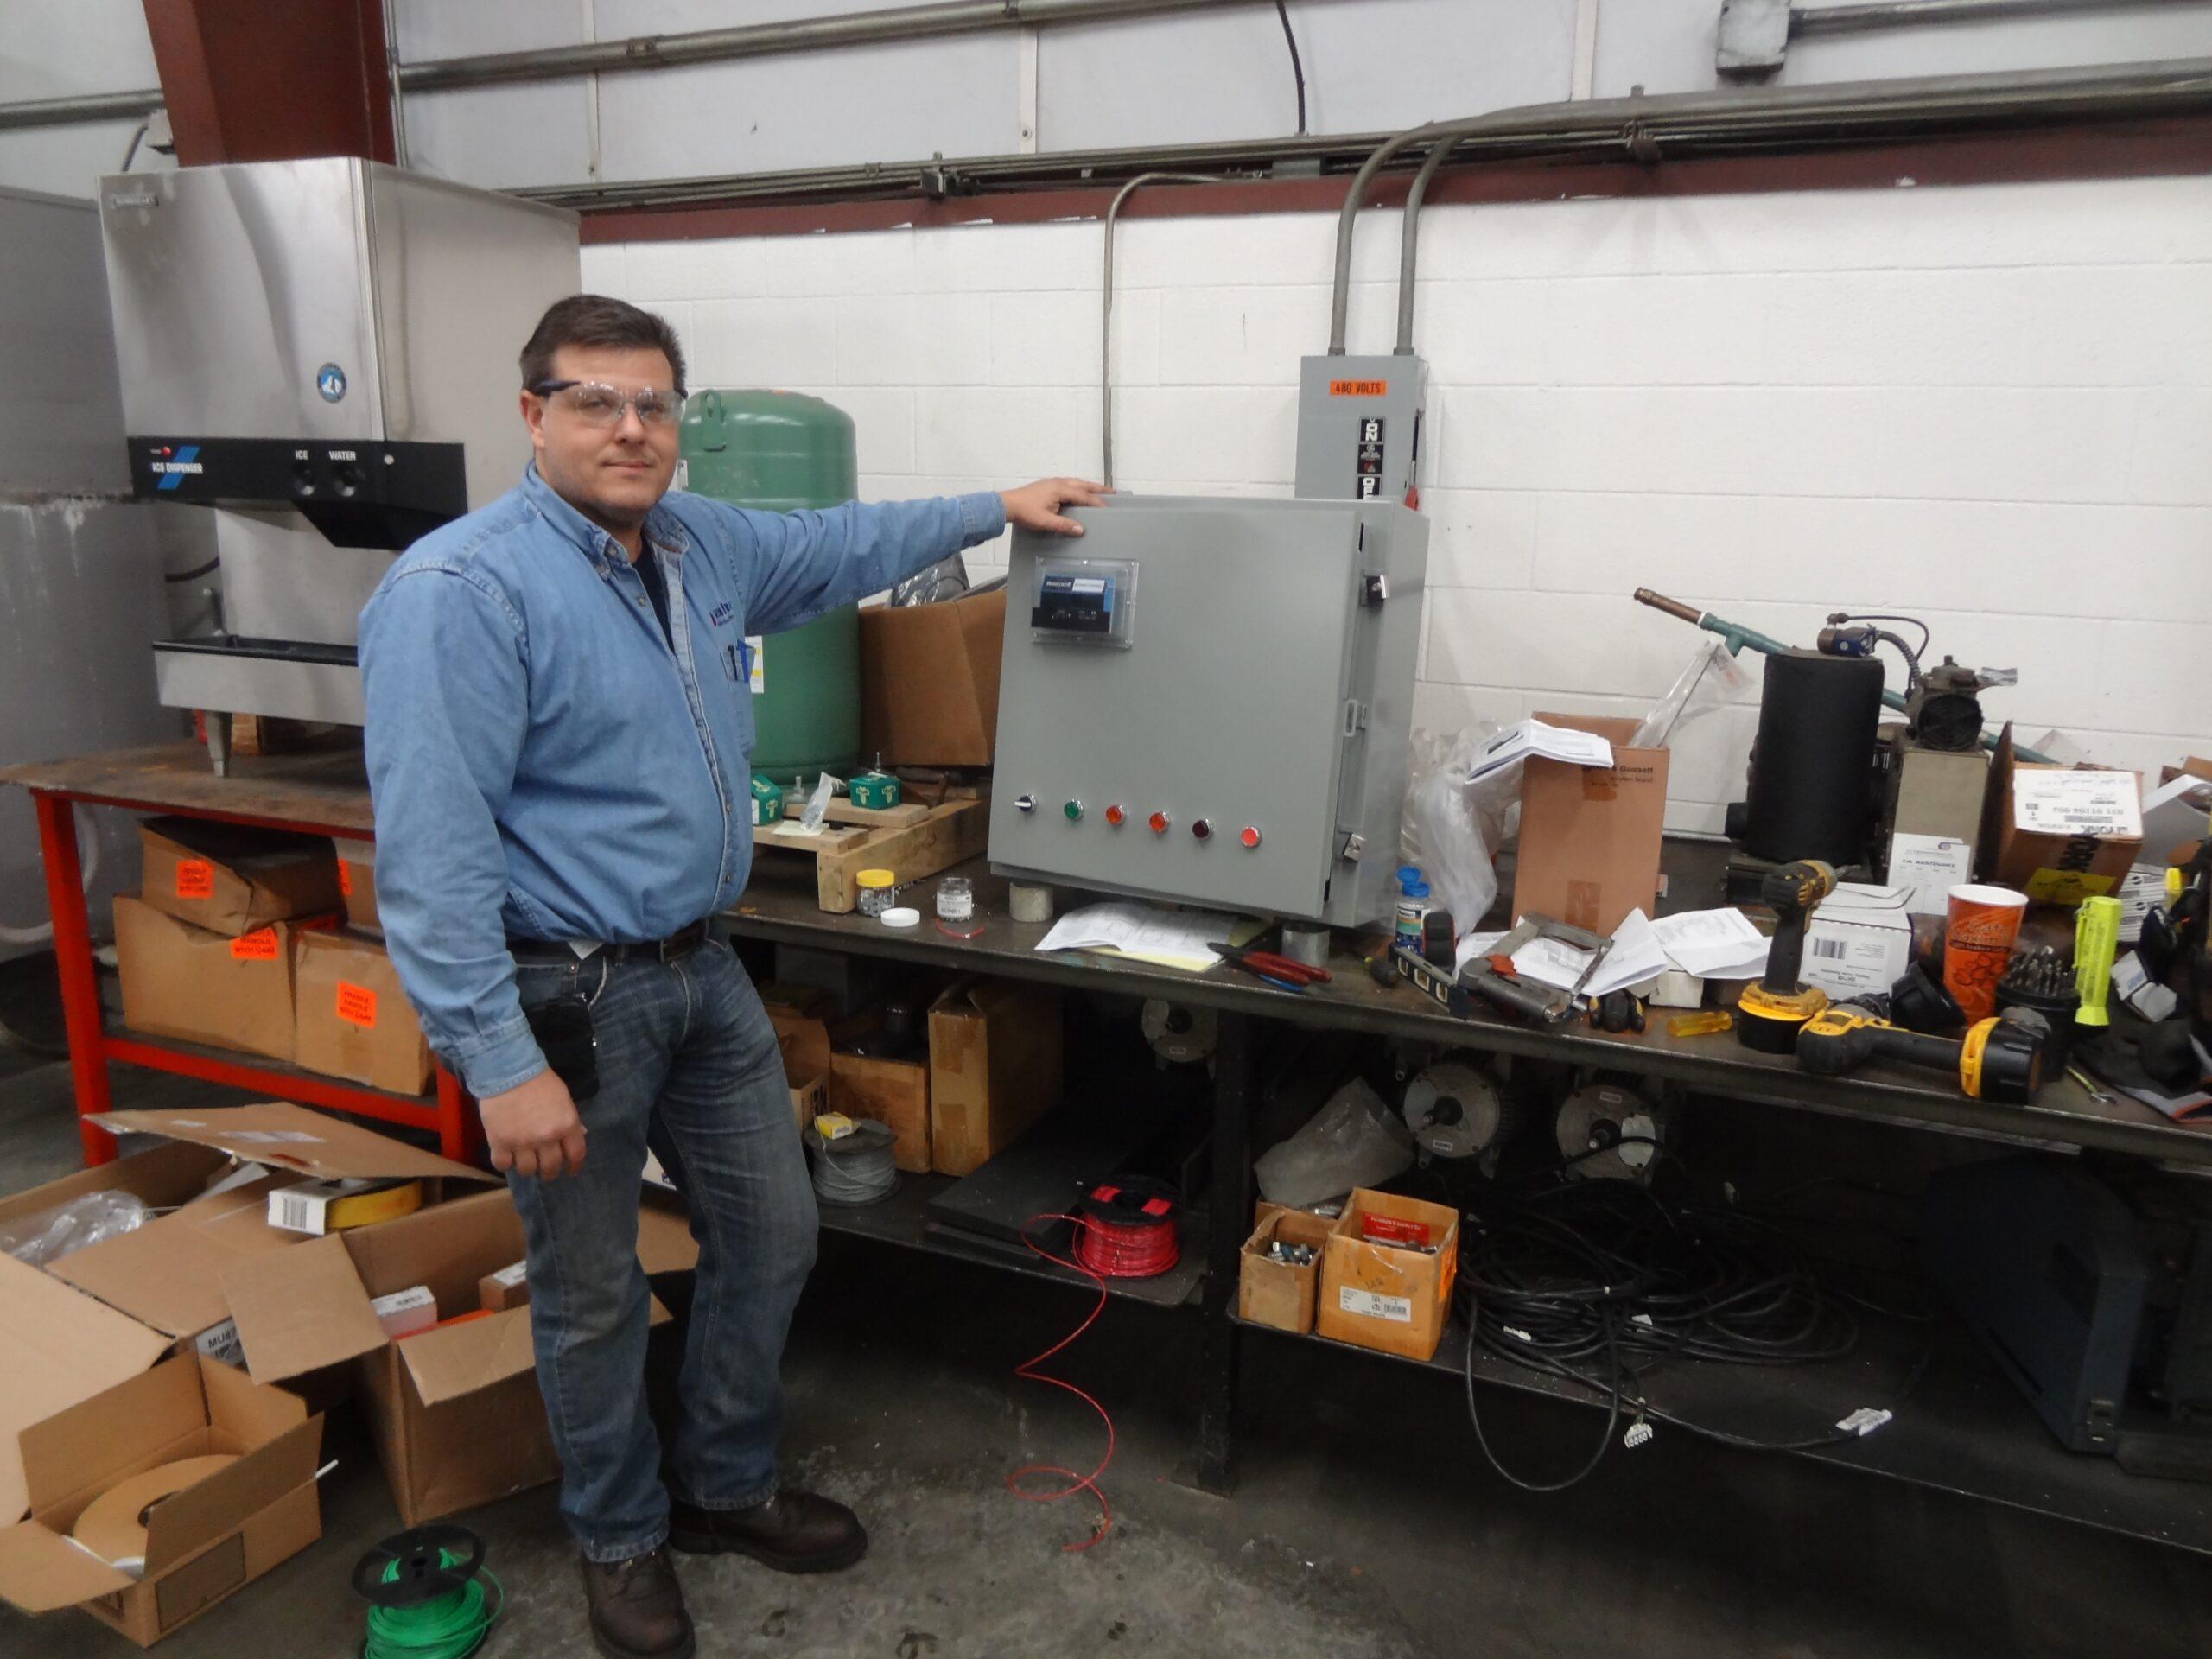 Boiler Service technician